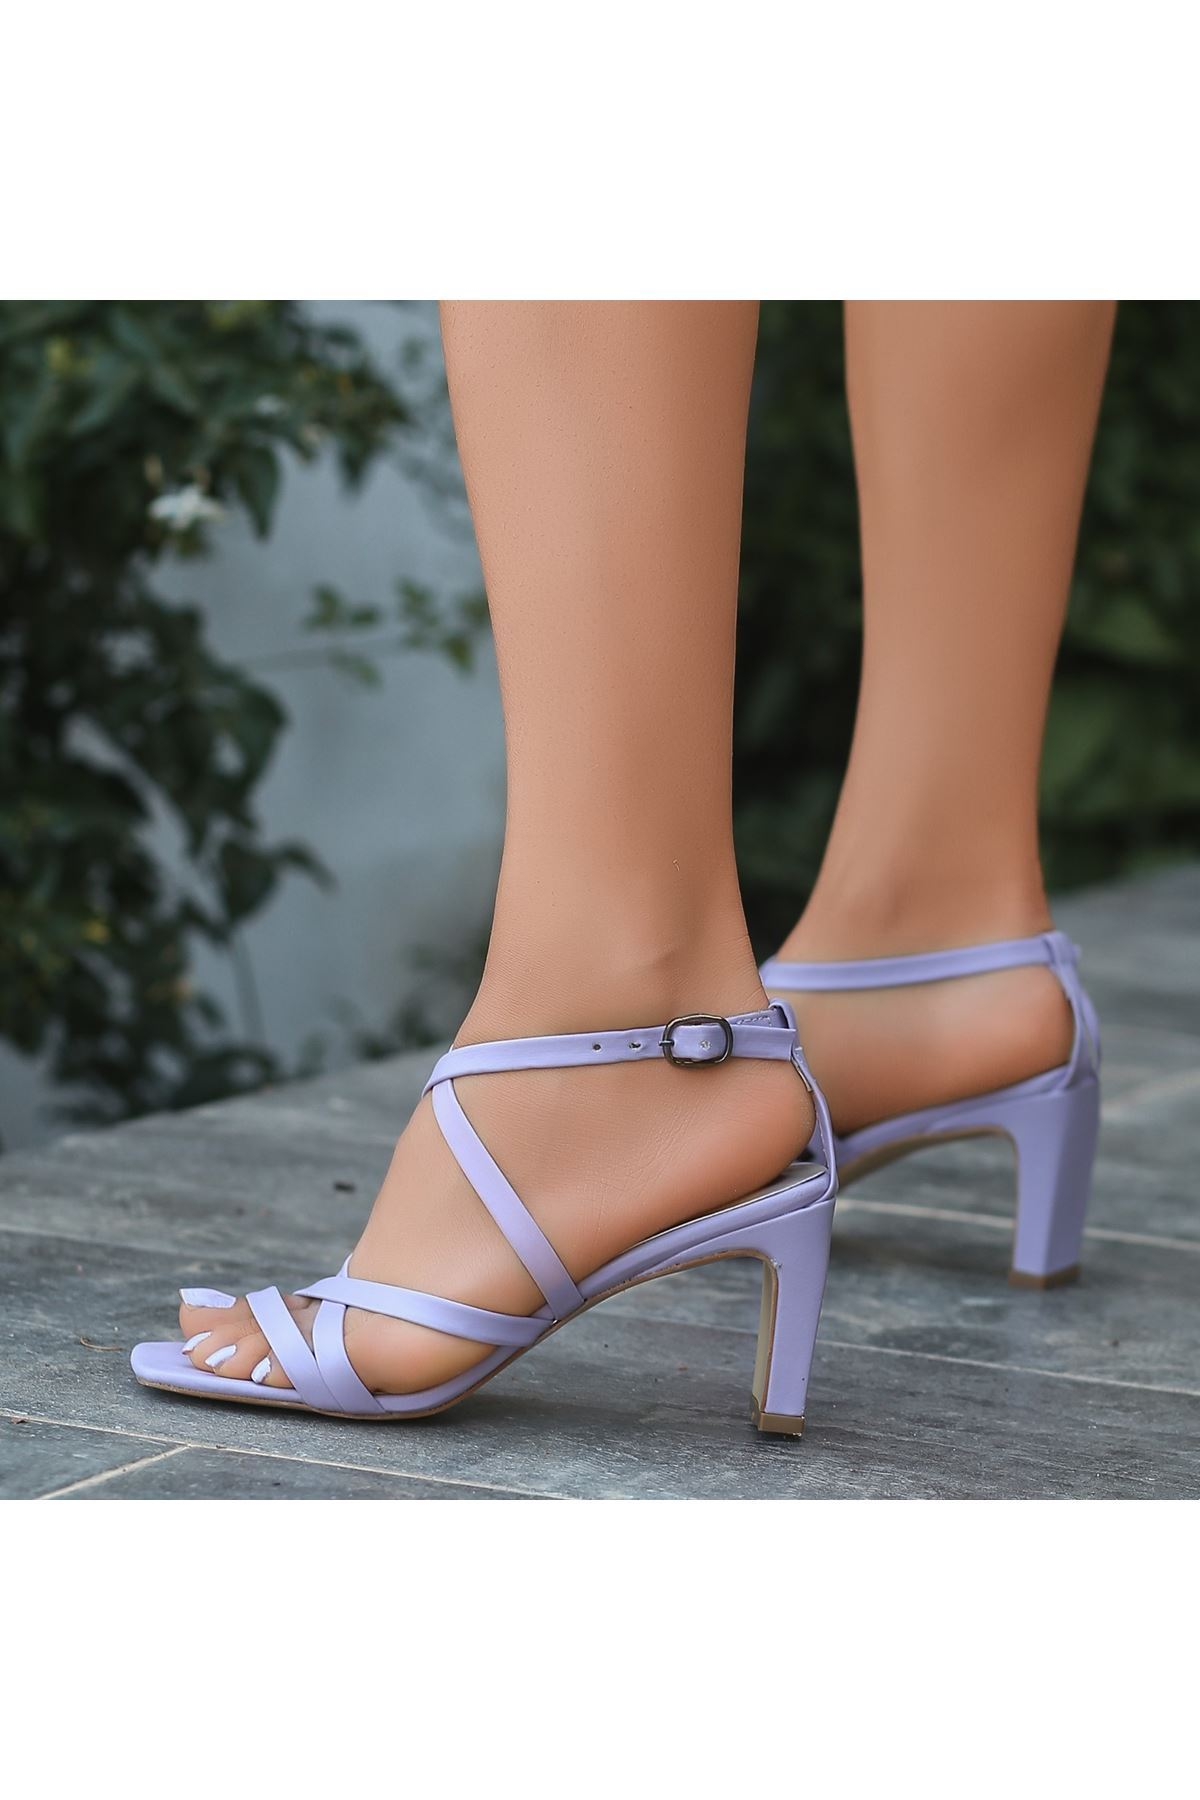 Utic Lila Cilt Topuklu Ayakkabı